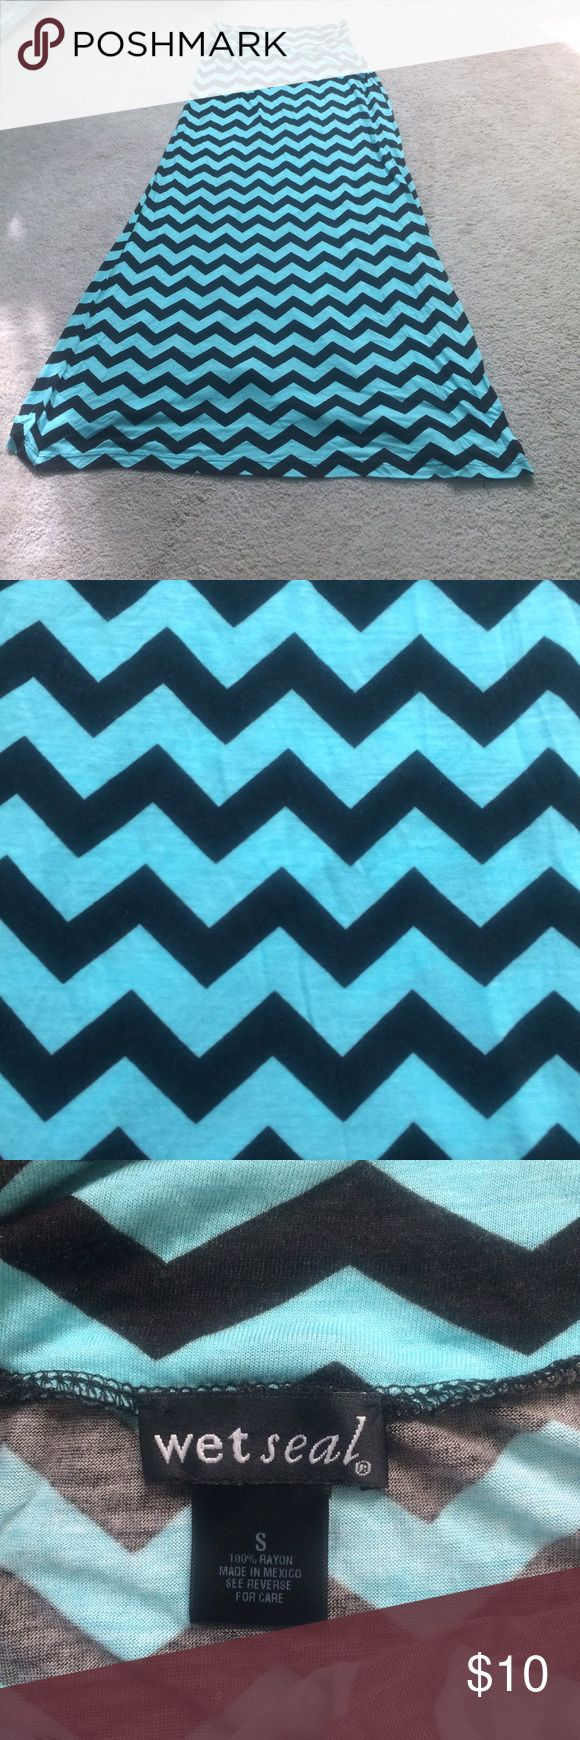 Zig zag chevron maxi skirt Aqua and black chevron maxi skirt. Never worn. Wet Seal Skirts Maxi